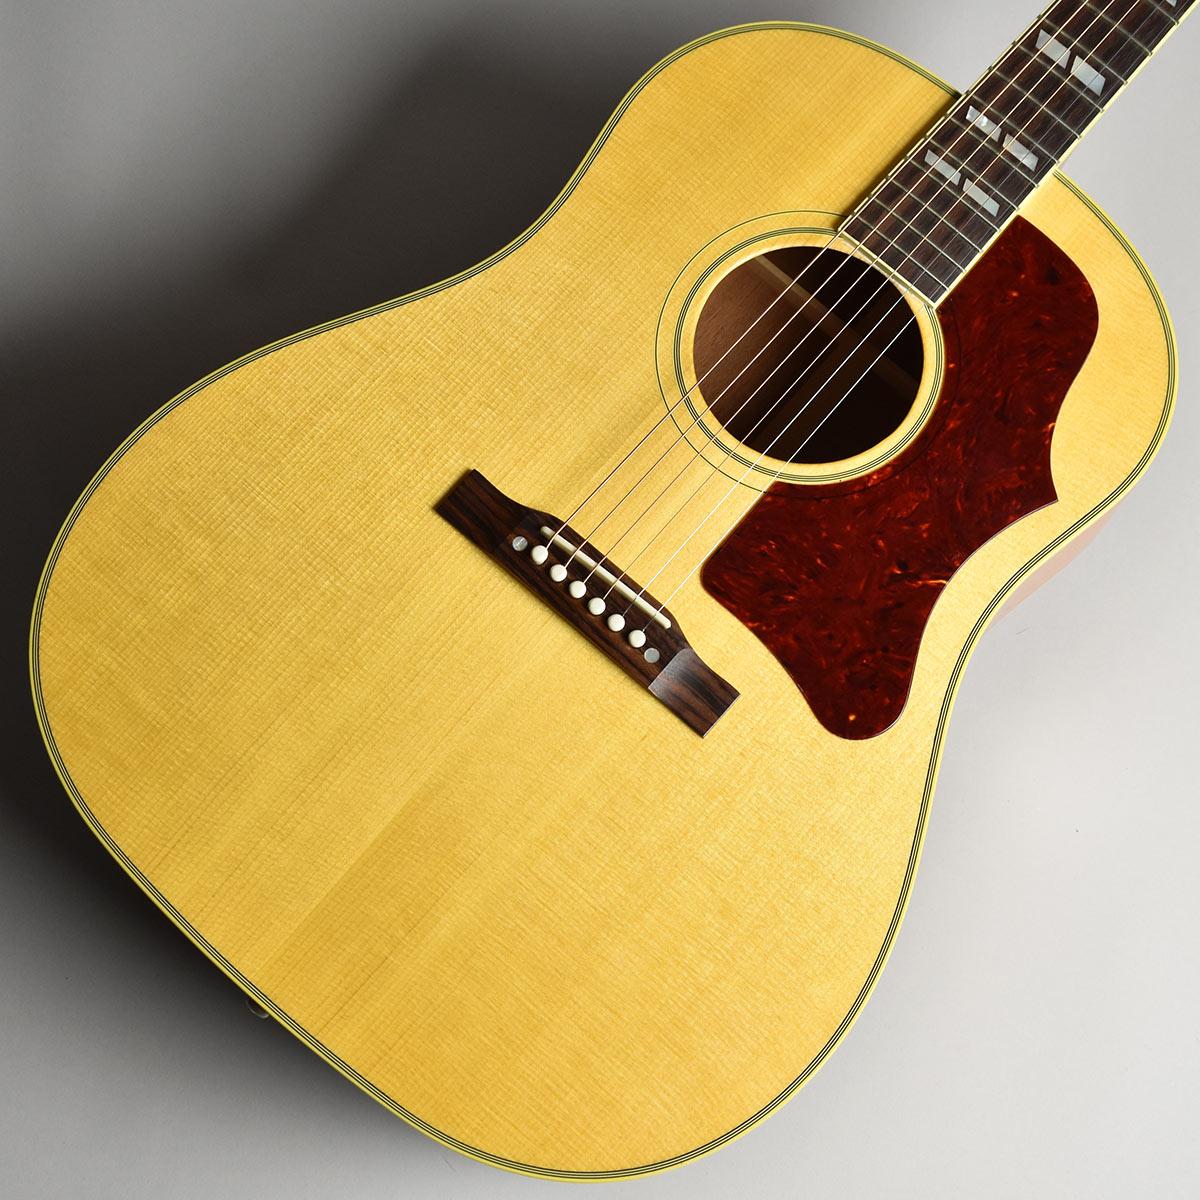 Gibson Southern Jumbo Triple Antique Natural S/N:12416044 【数量限定特典 ギグバック付属】【アウトレット品】 【ギブソン サザンジャンボ】【未展示品】